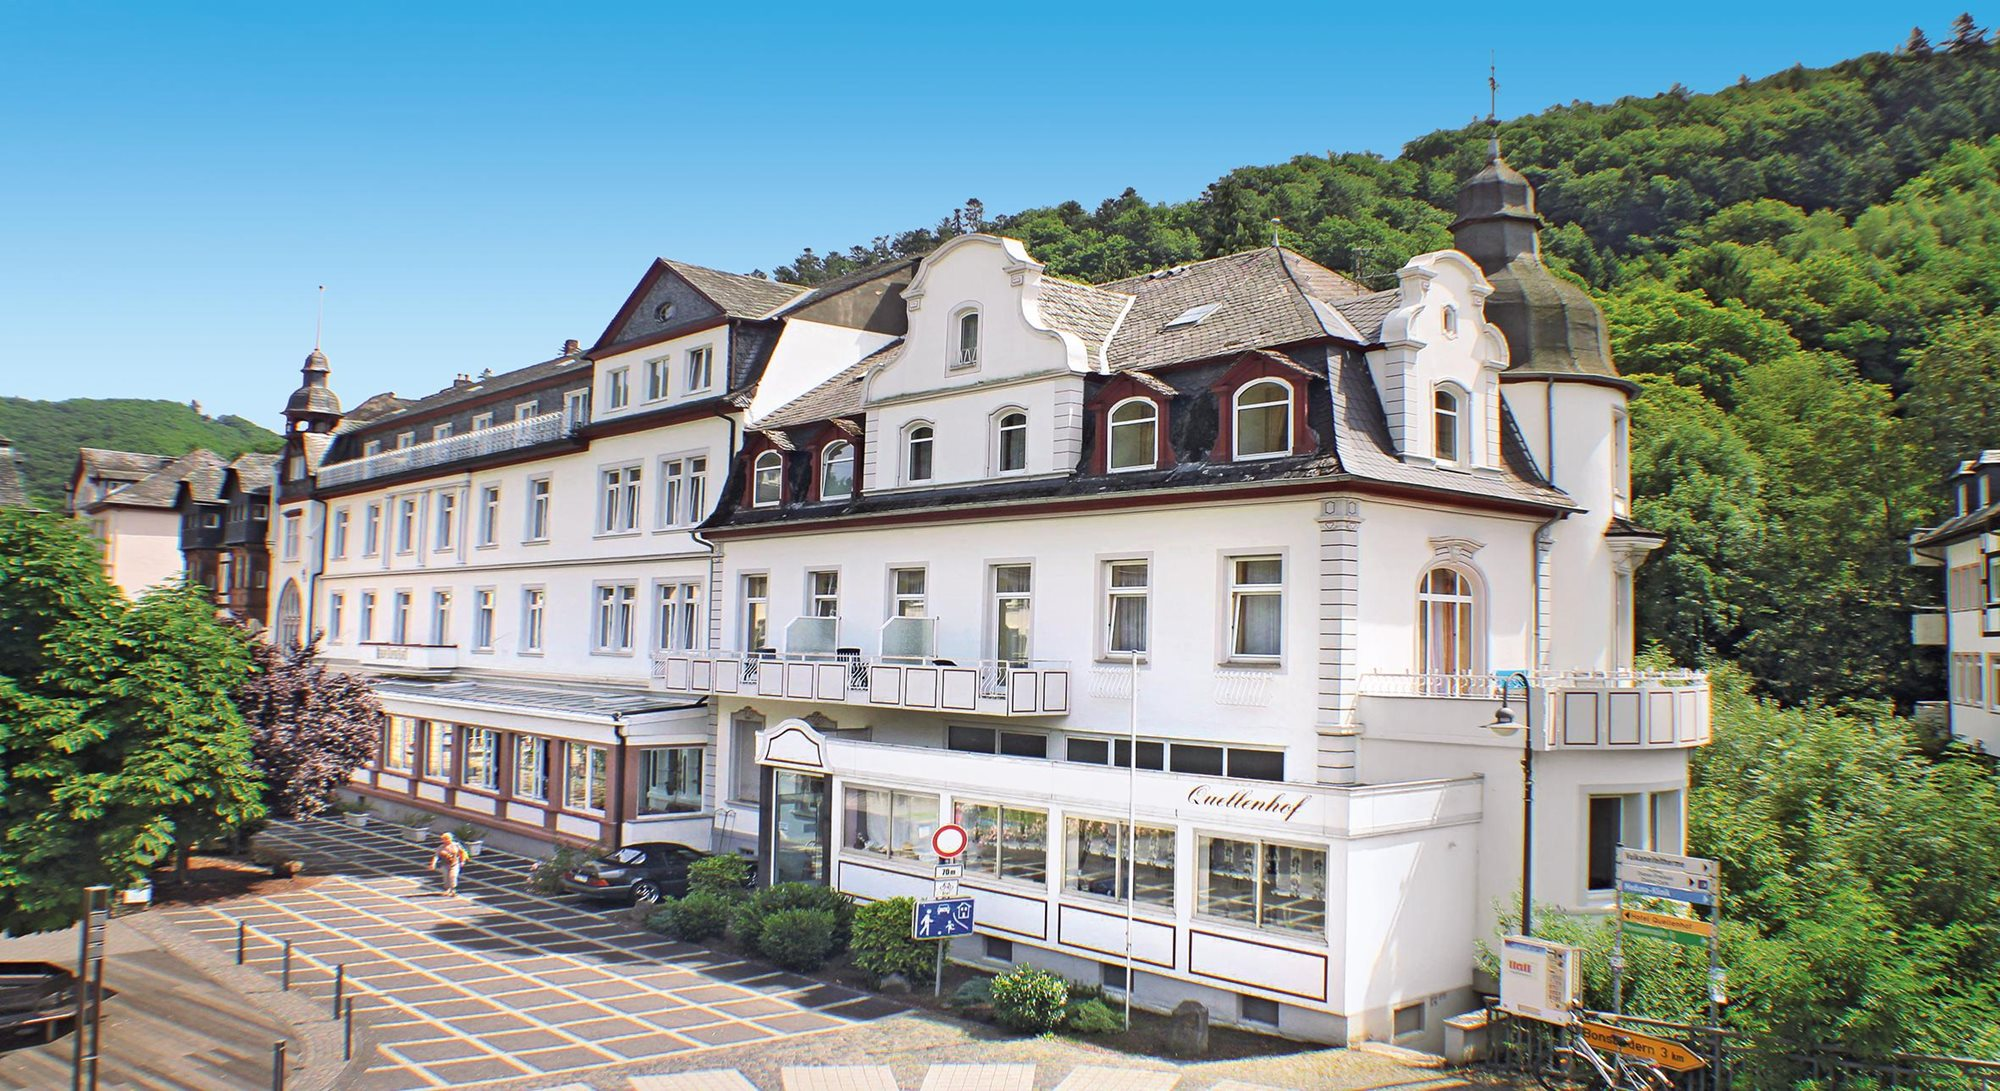 Kurhotel Quellenhof, fasting for arthritis, SpaDreams